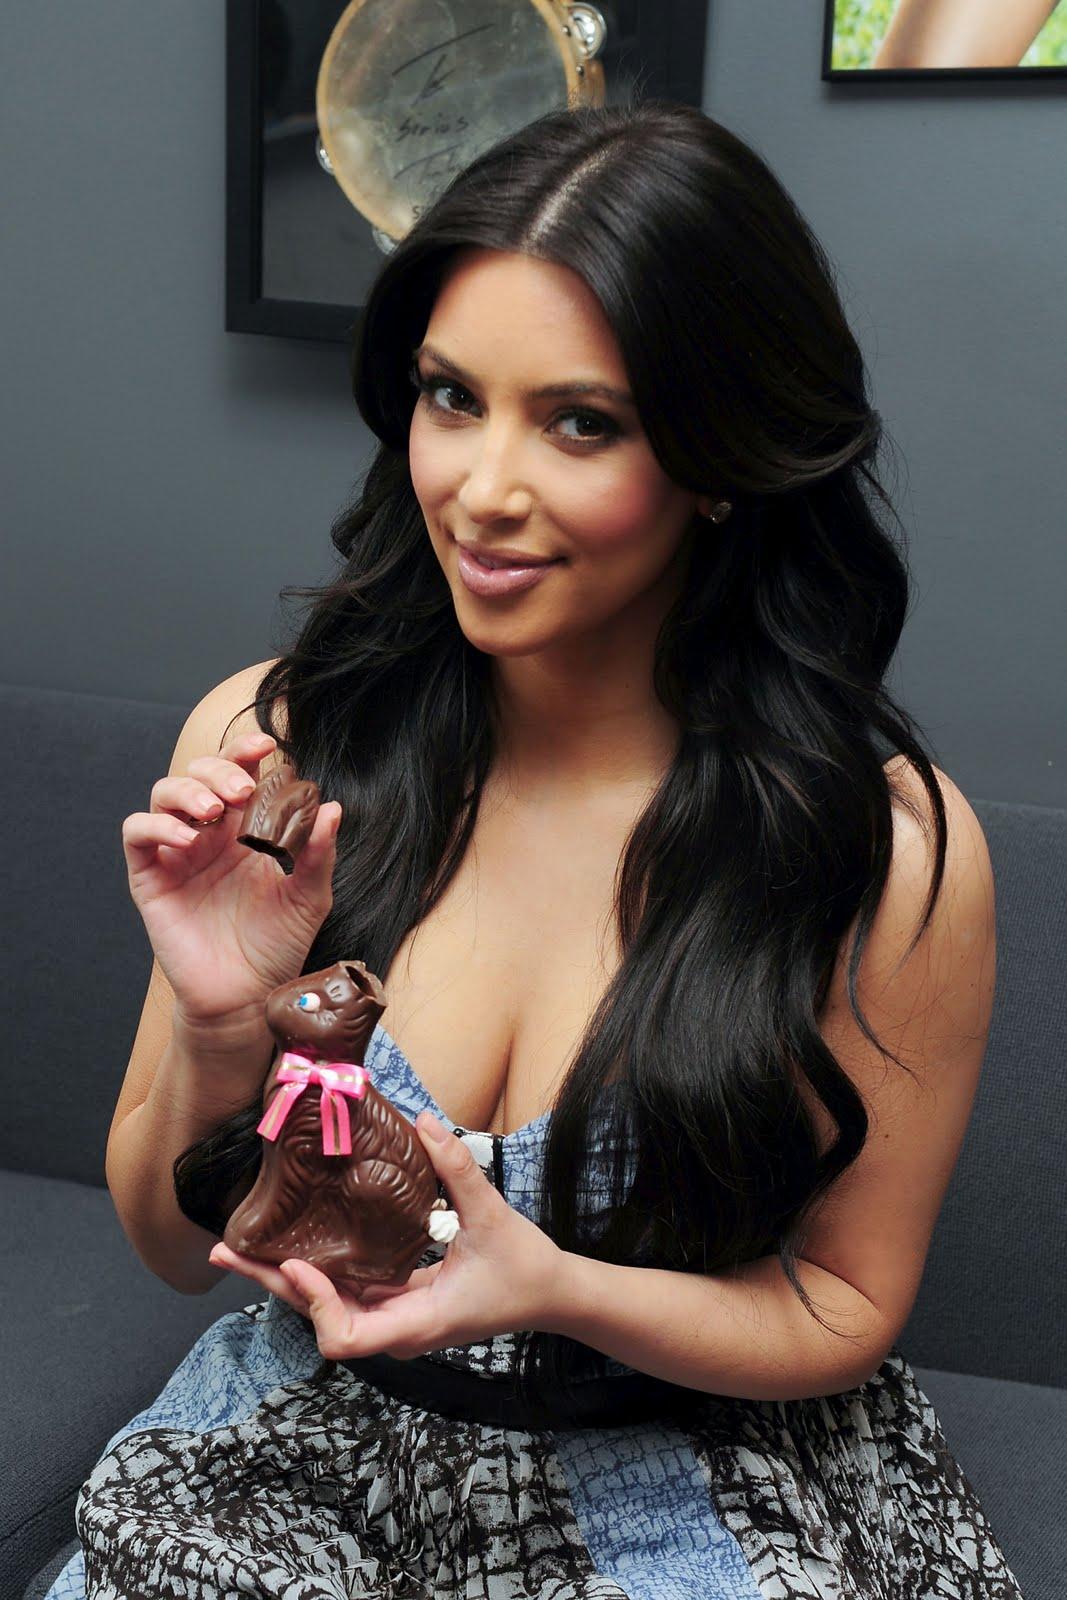 http://3.bp.blogspot.com/-aMa9NwtBwMU/Ta2DB1hxAlI/AAAAAAAAC5Q/I5Dh0zfQZIE/s1600/Kim-Kardashian-39.jpg